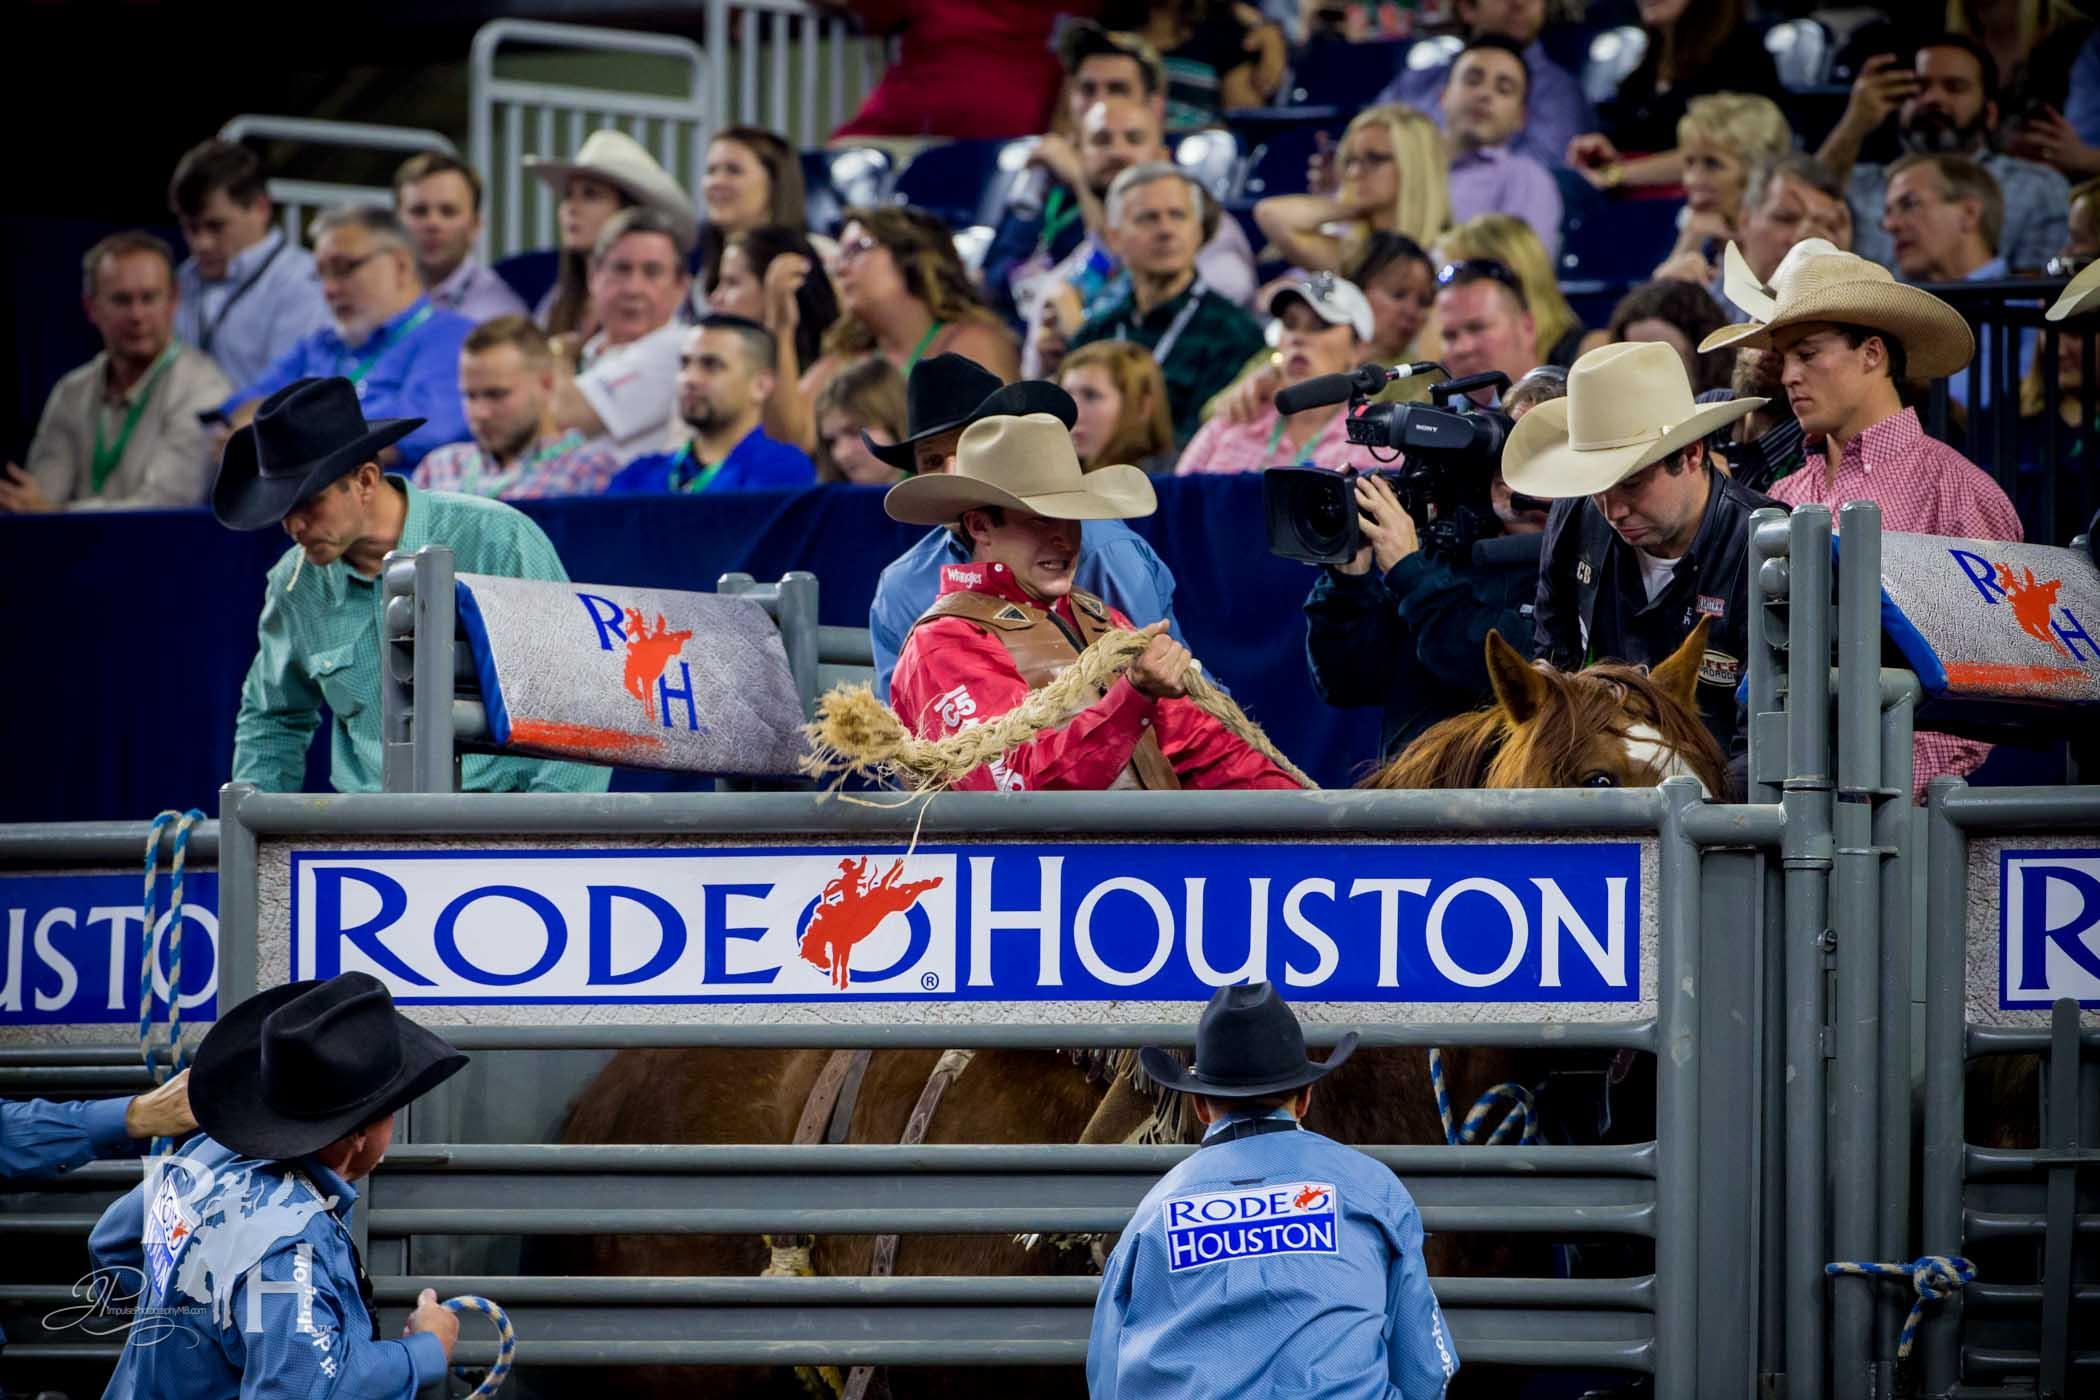 photo courtesy of RodeoHouston